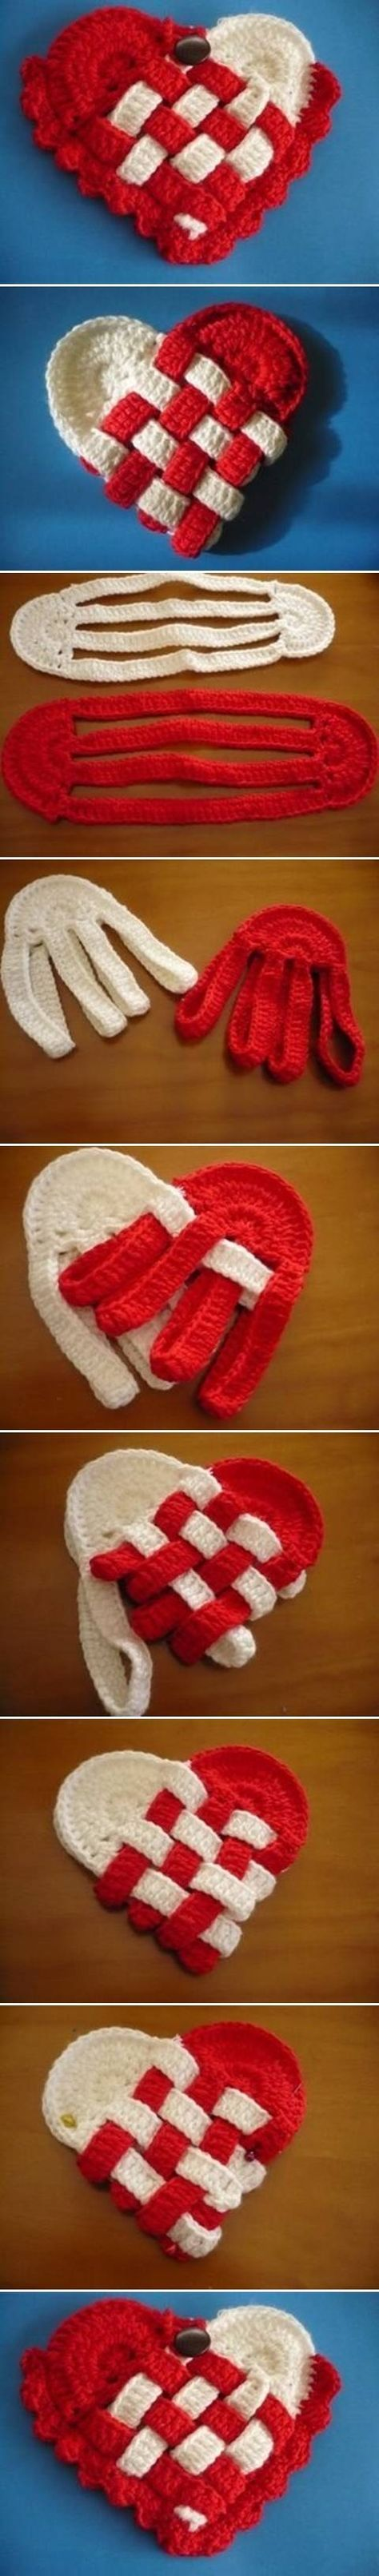 DIY Simple Crochet Heart